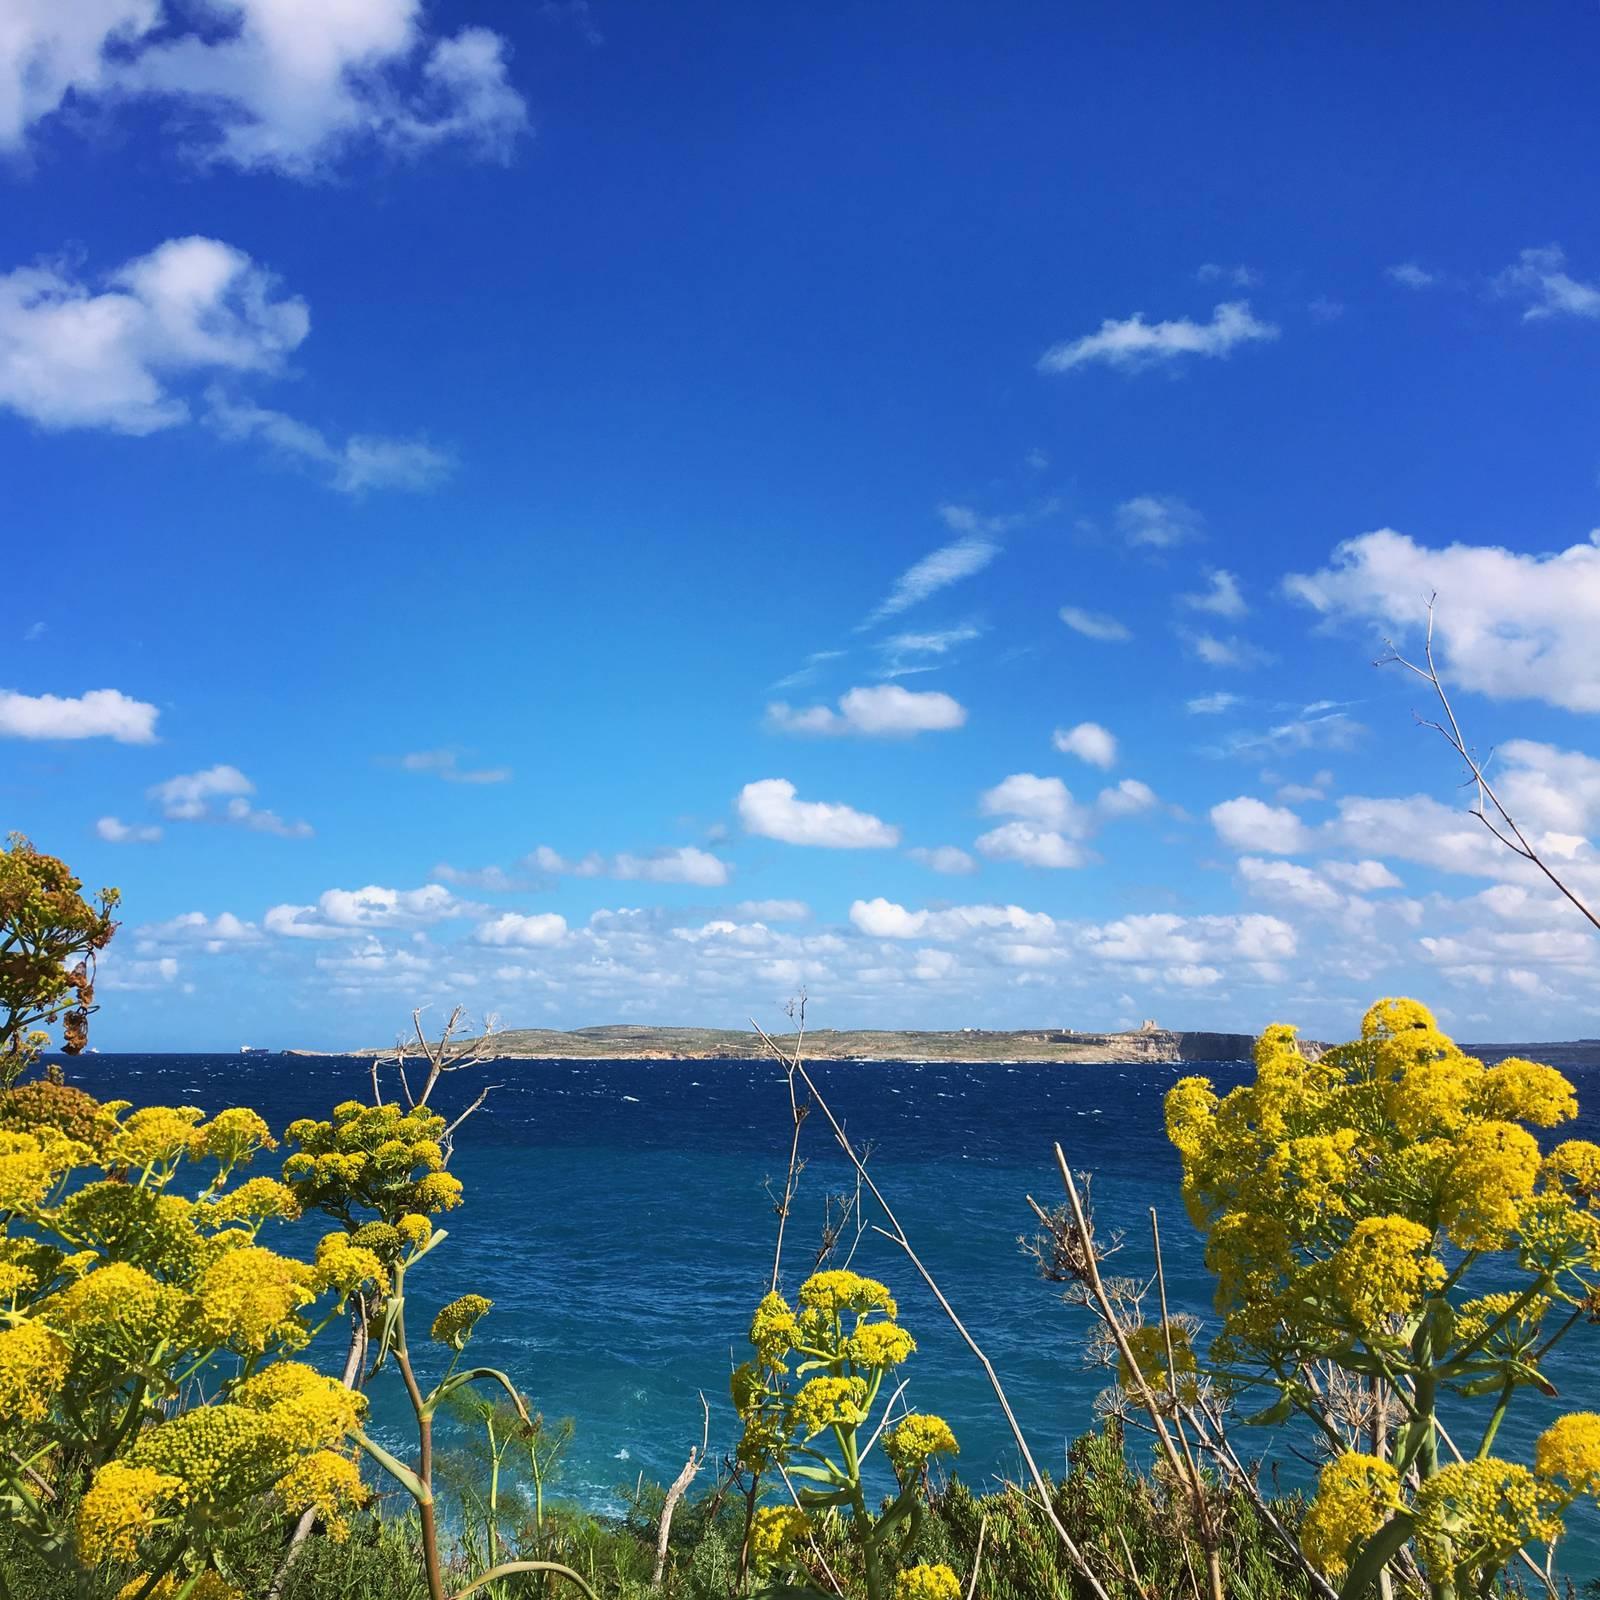 The island of Comino